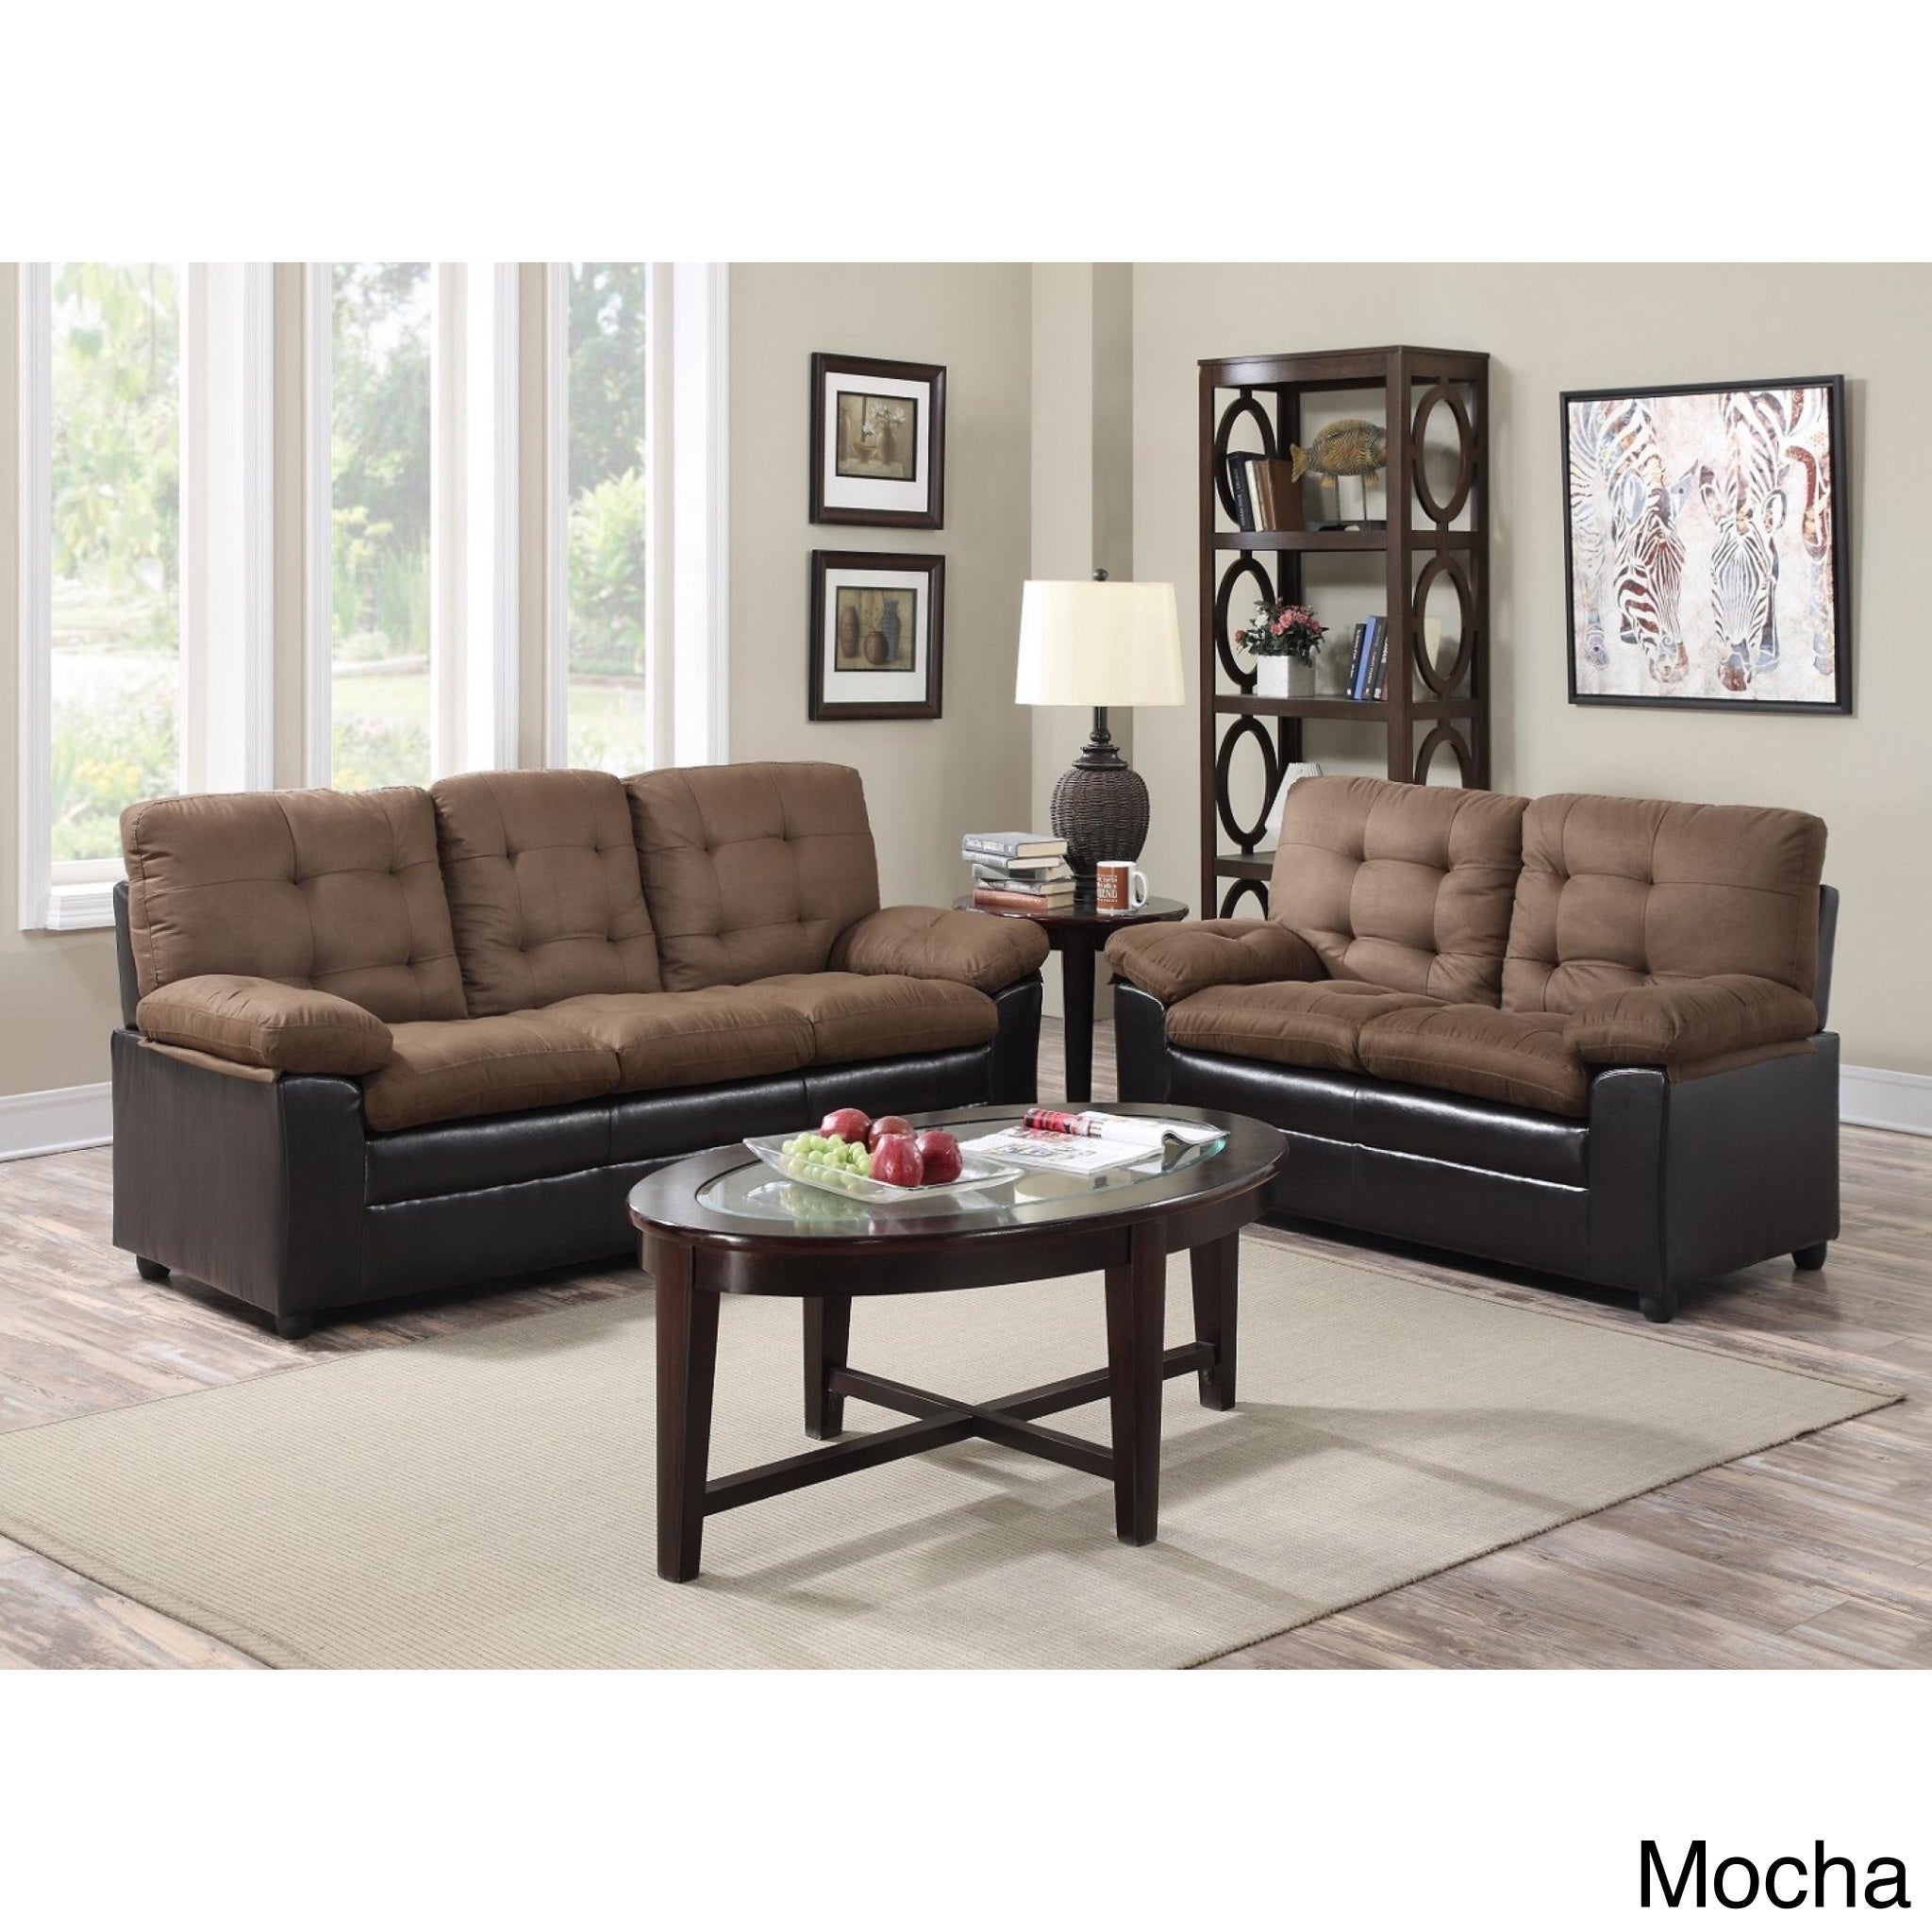 Two-Tone Microfiber Sofa And Loveseat Set